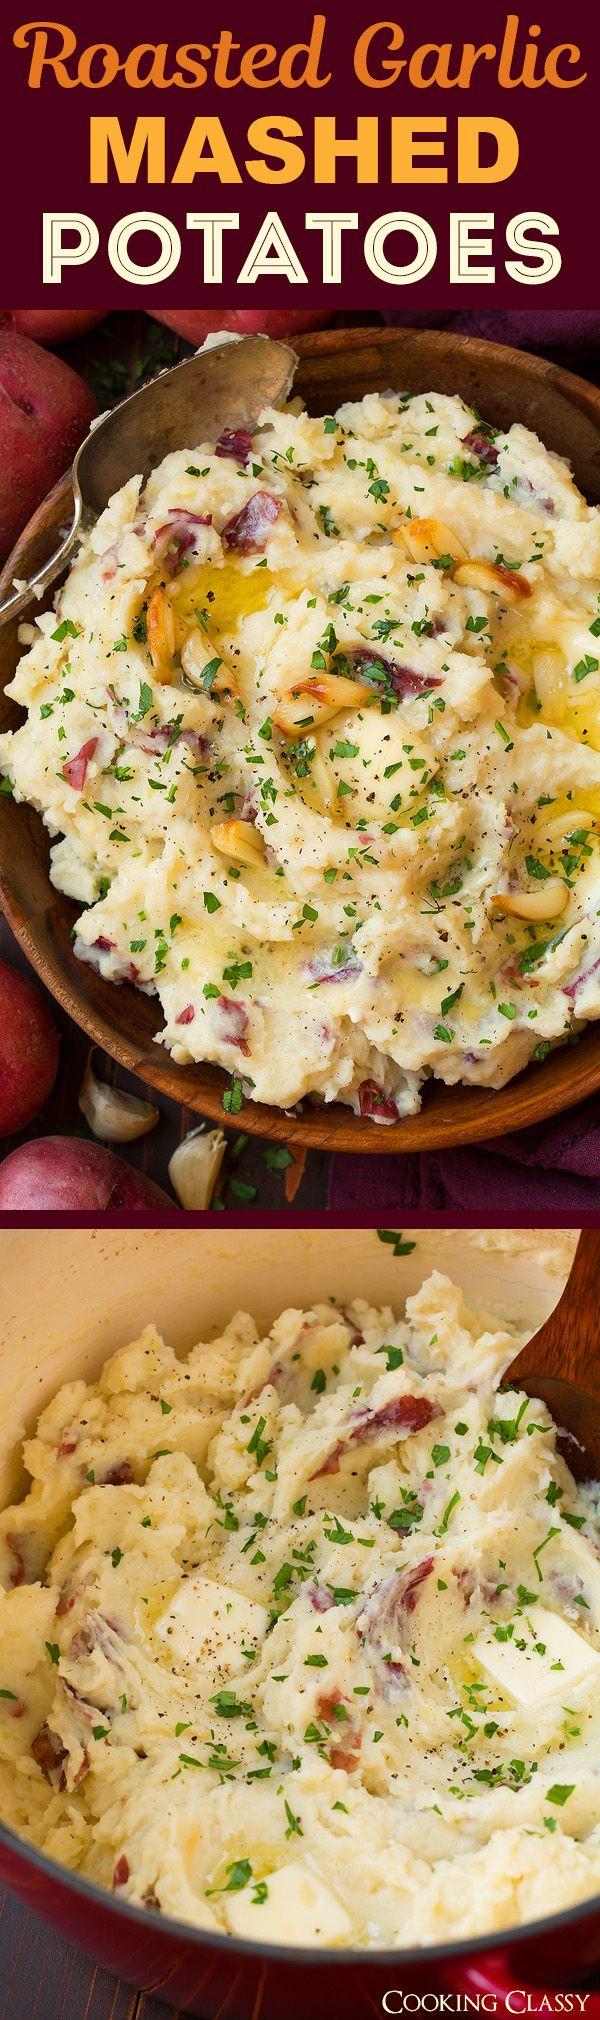 Roasted Garlic Mashed Potatoes – the ultimate comfort food! The roasted garlic mak